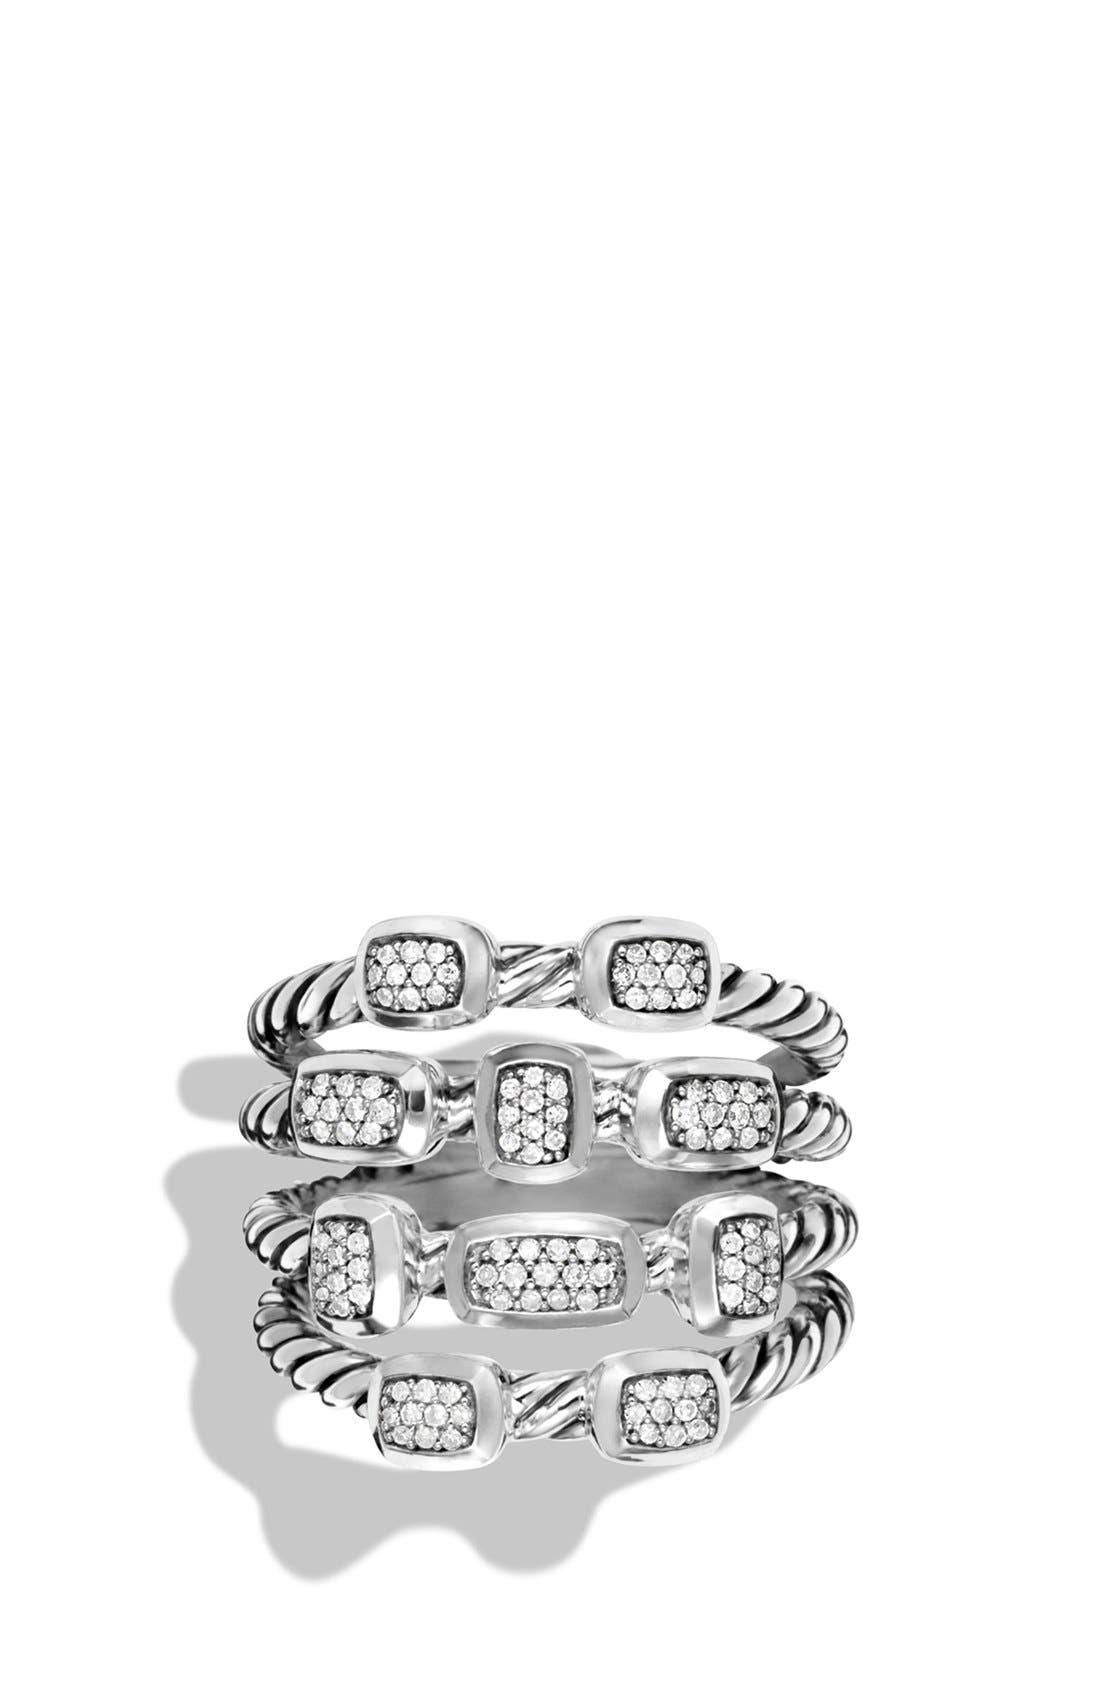 David Yurman 'Confetti' Ring with Diamonds